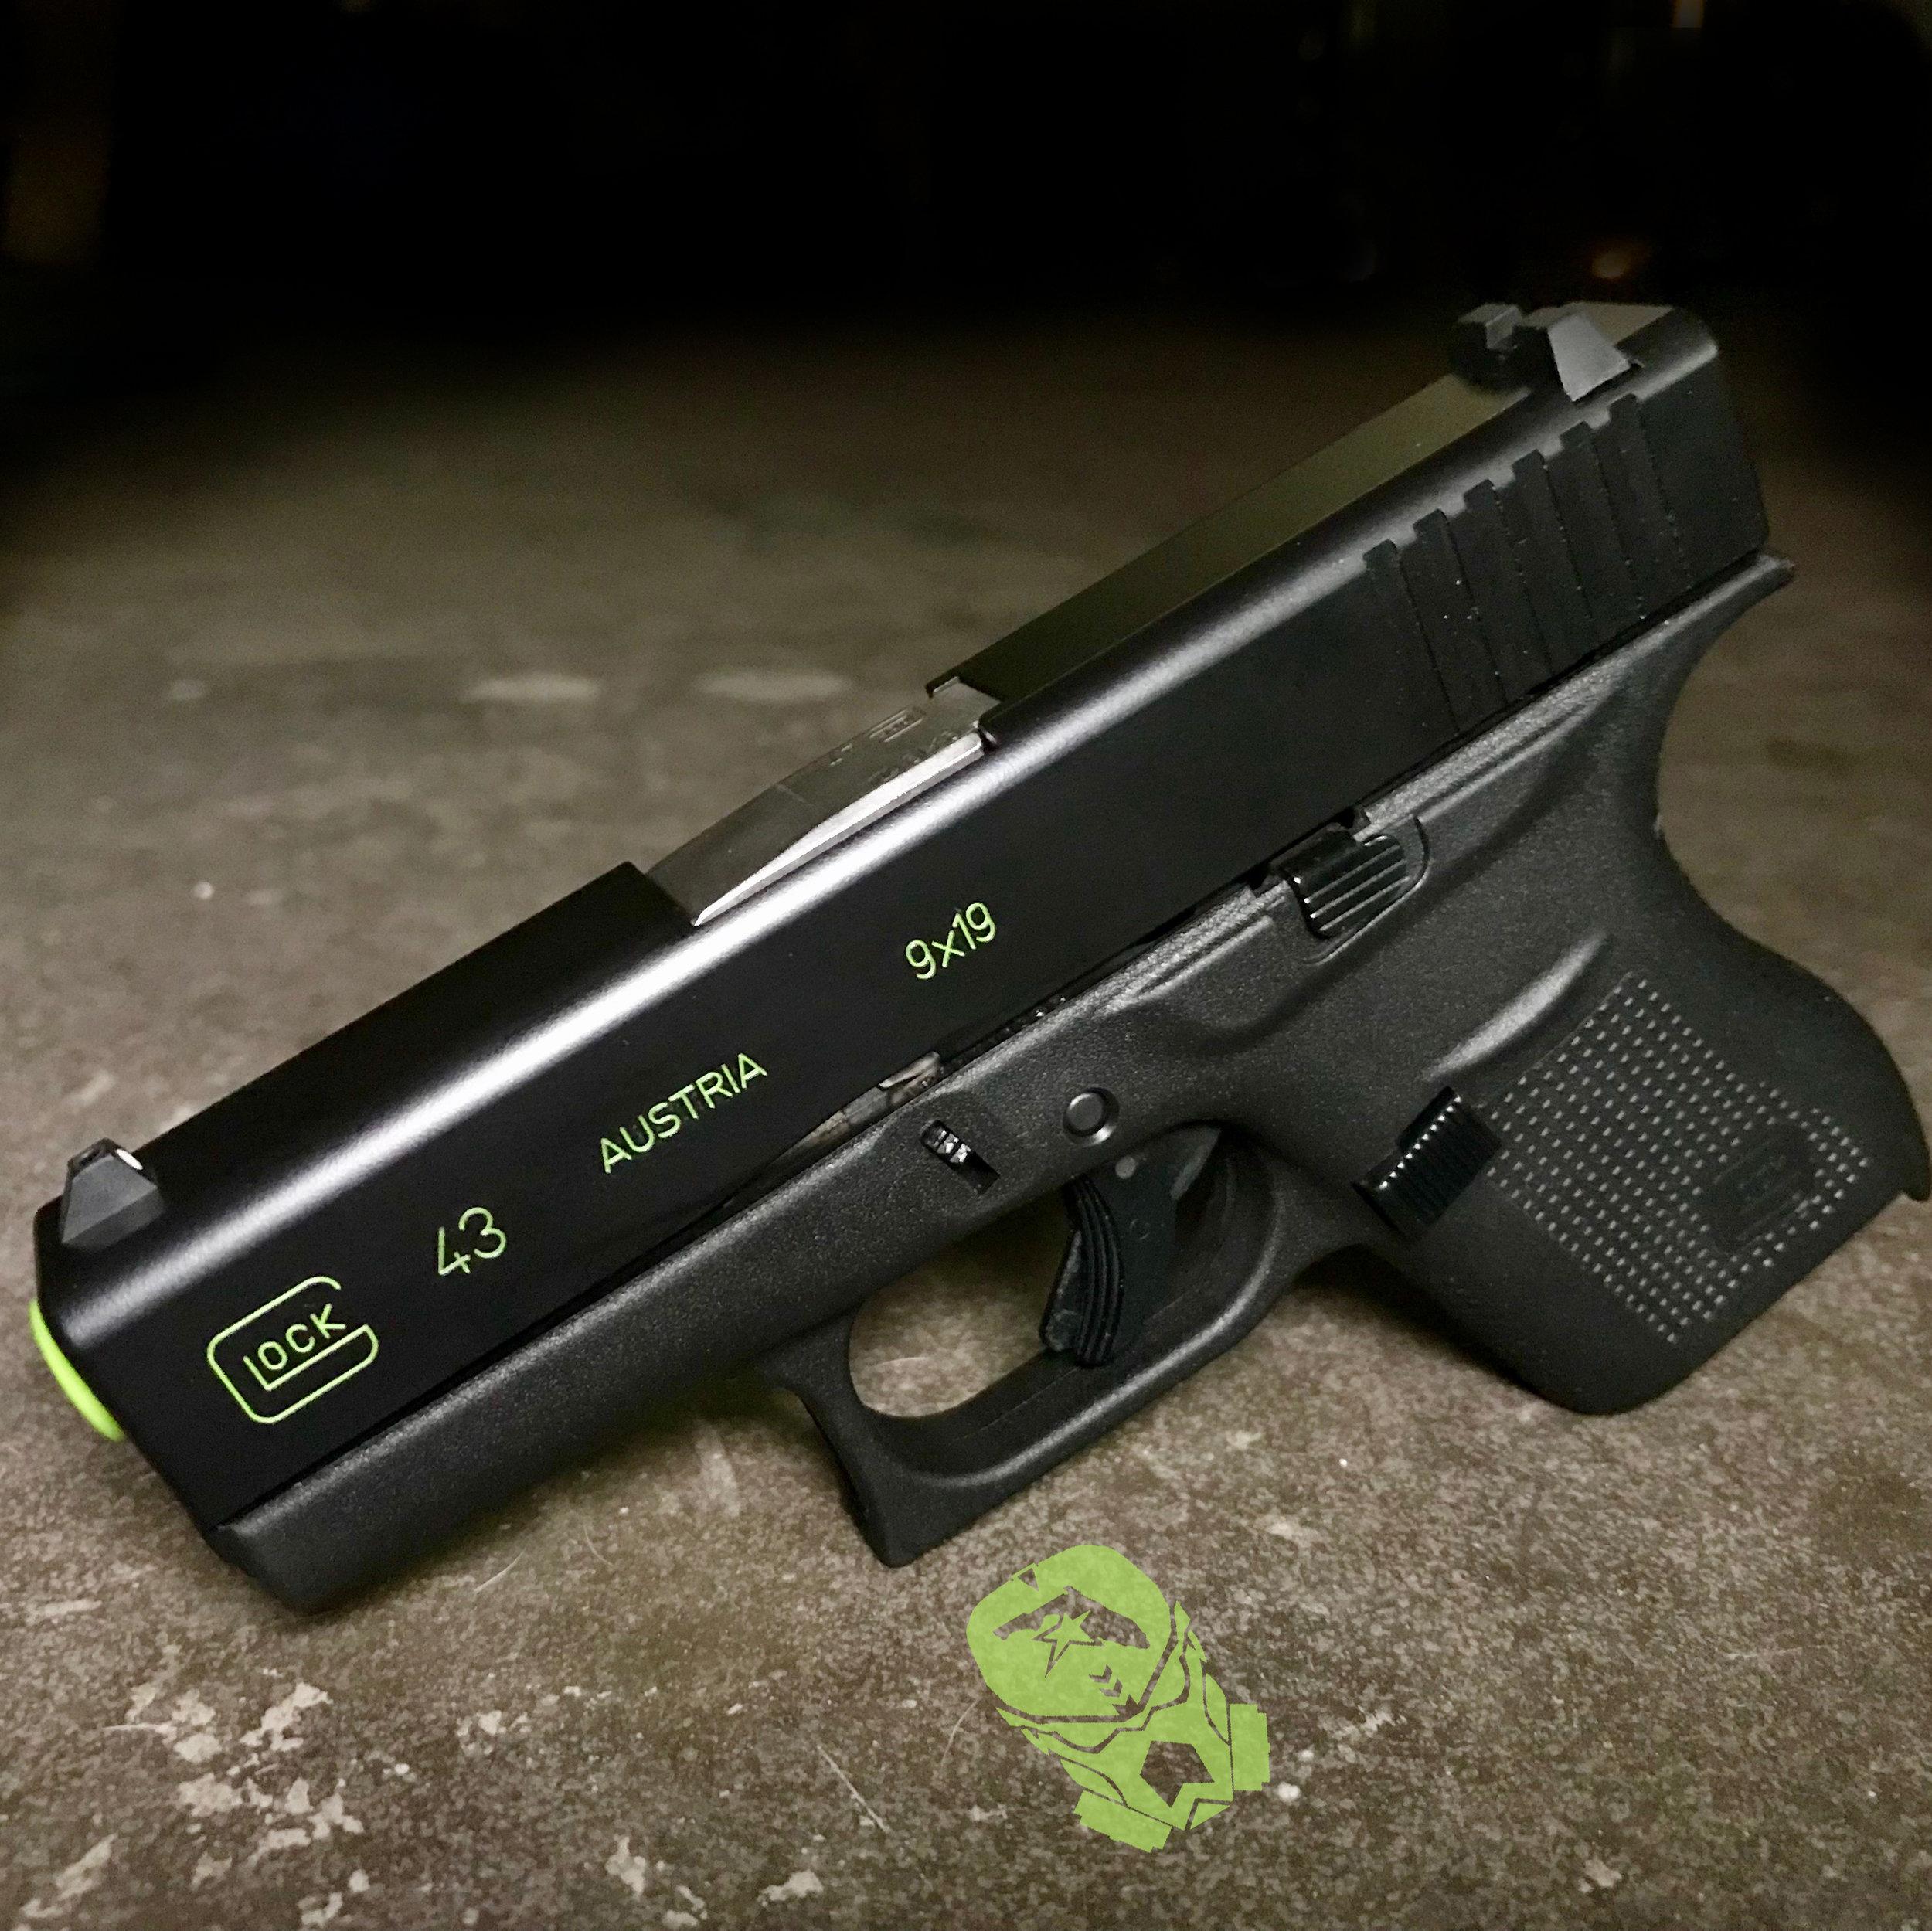 Glock_43_green_colorfill.jpg